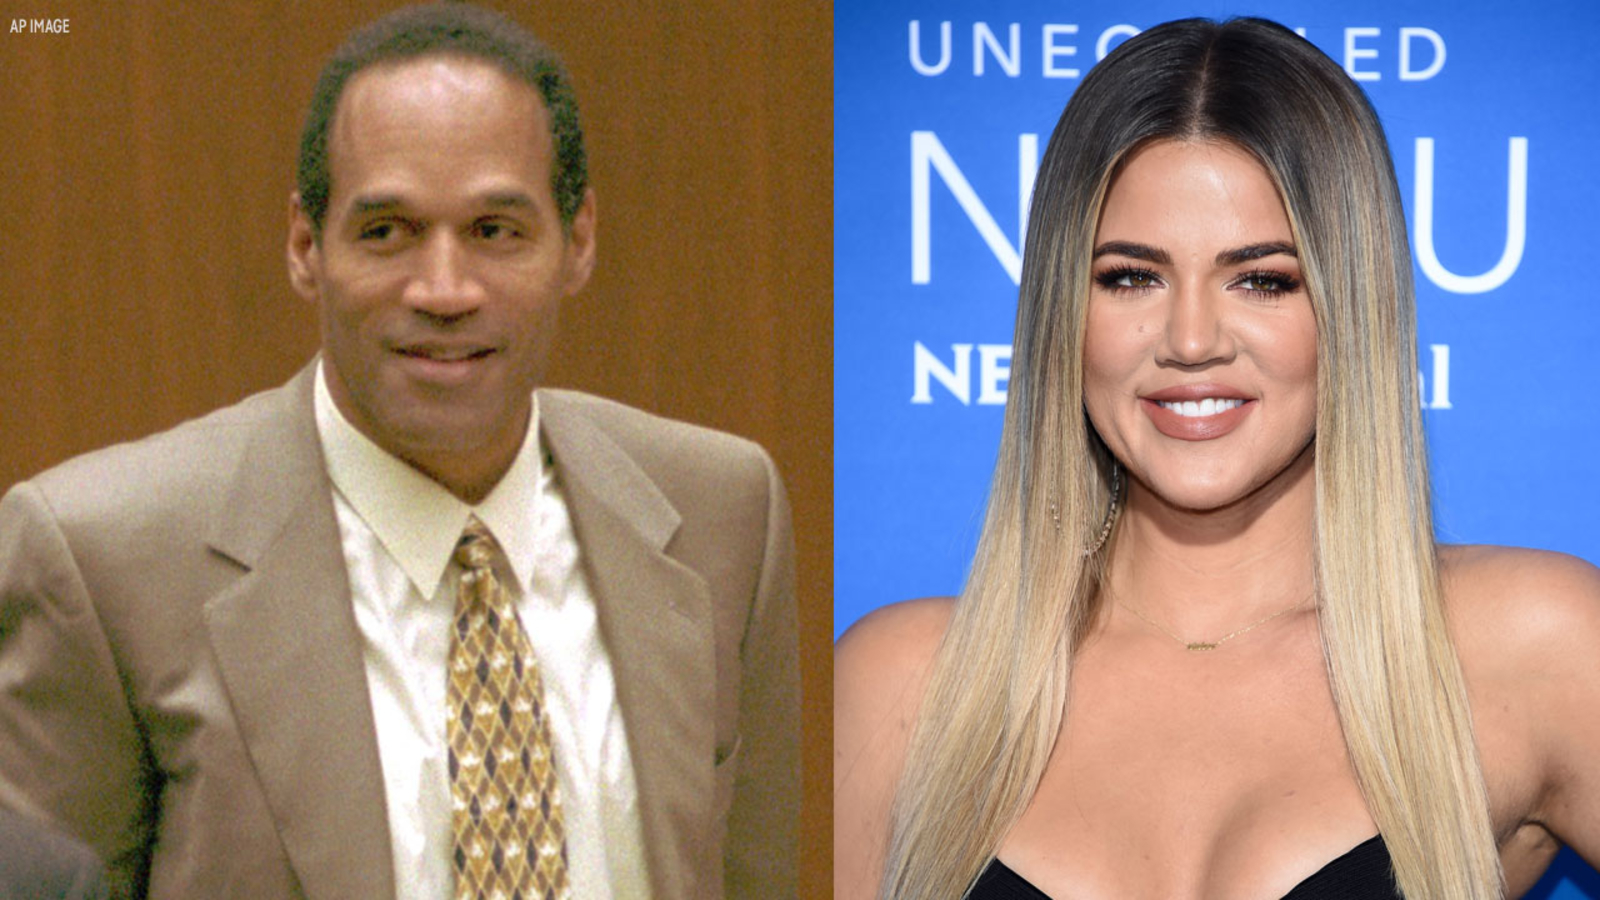 O.J. Simpson addresses long-circulated rumors that he's Khloe Kardashian's dad